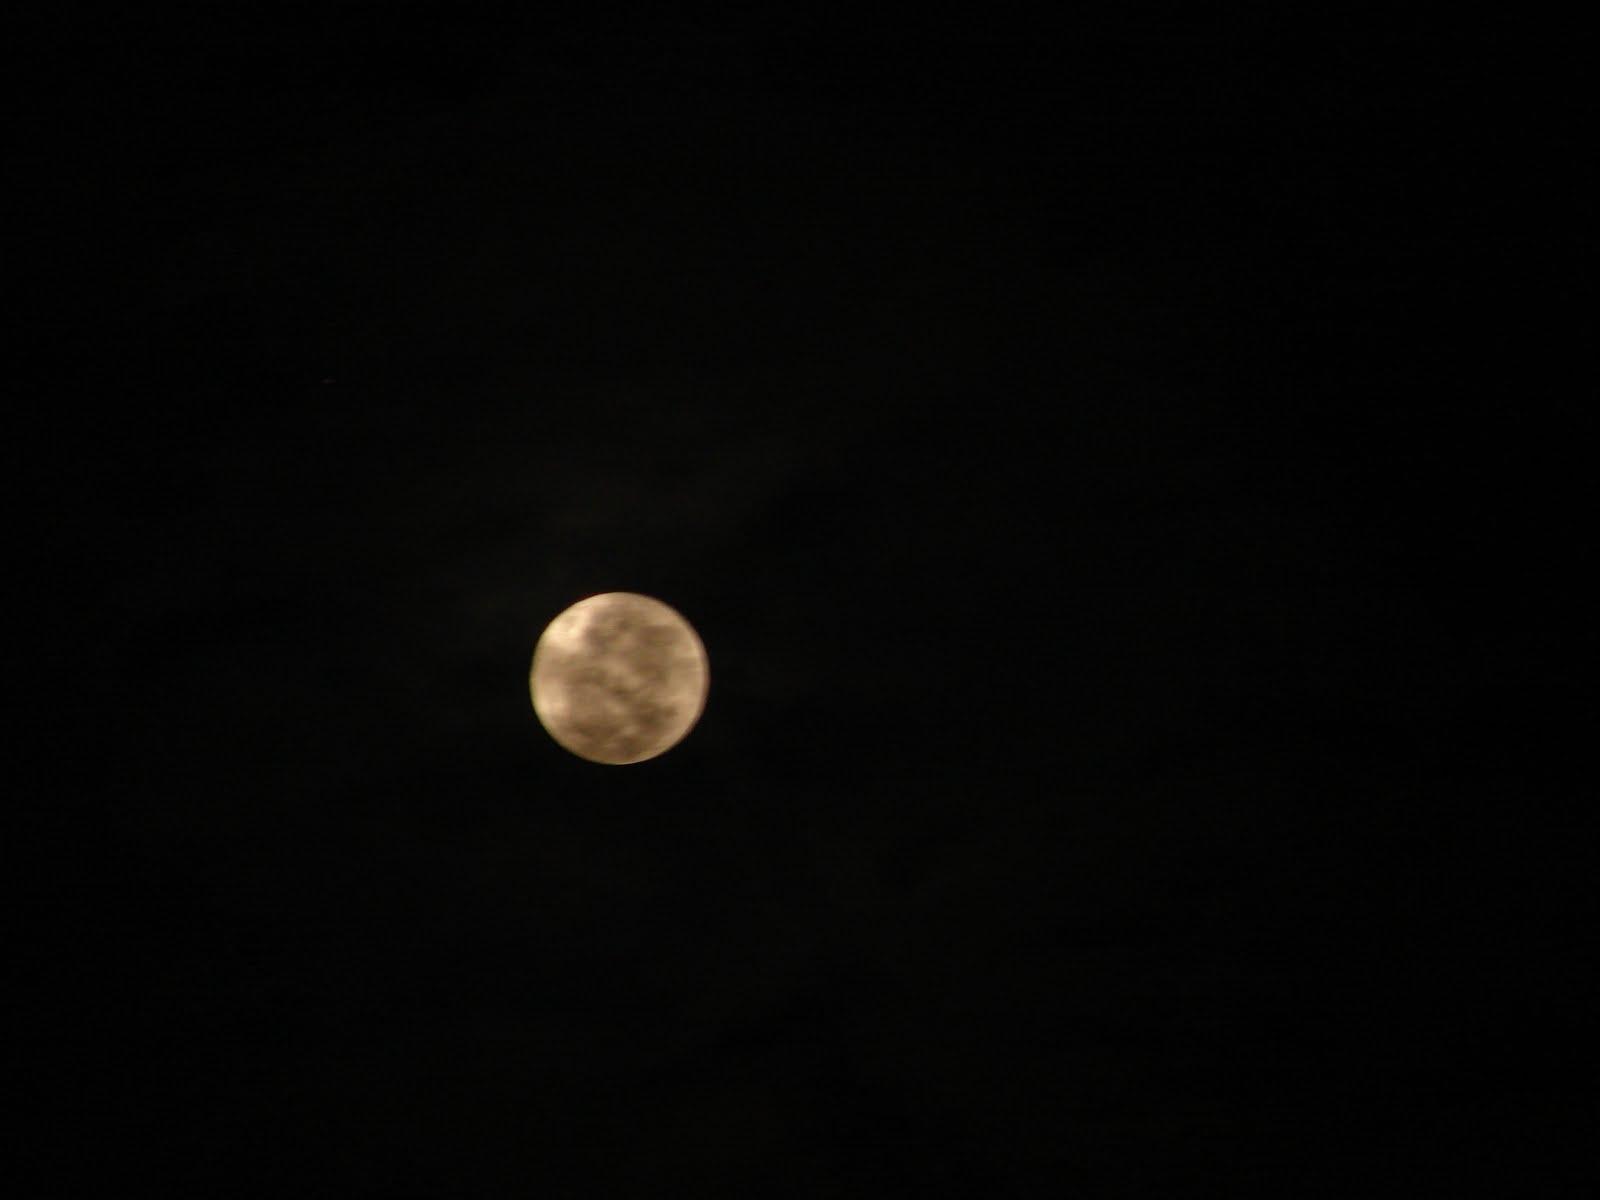 28-29-30-noviembre-2012 La LUNA llena eclipse Lunar lumbral LUNA roja x Fito.33.p.N#-1-Mundo AMEN.